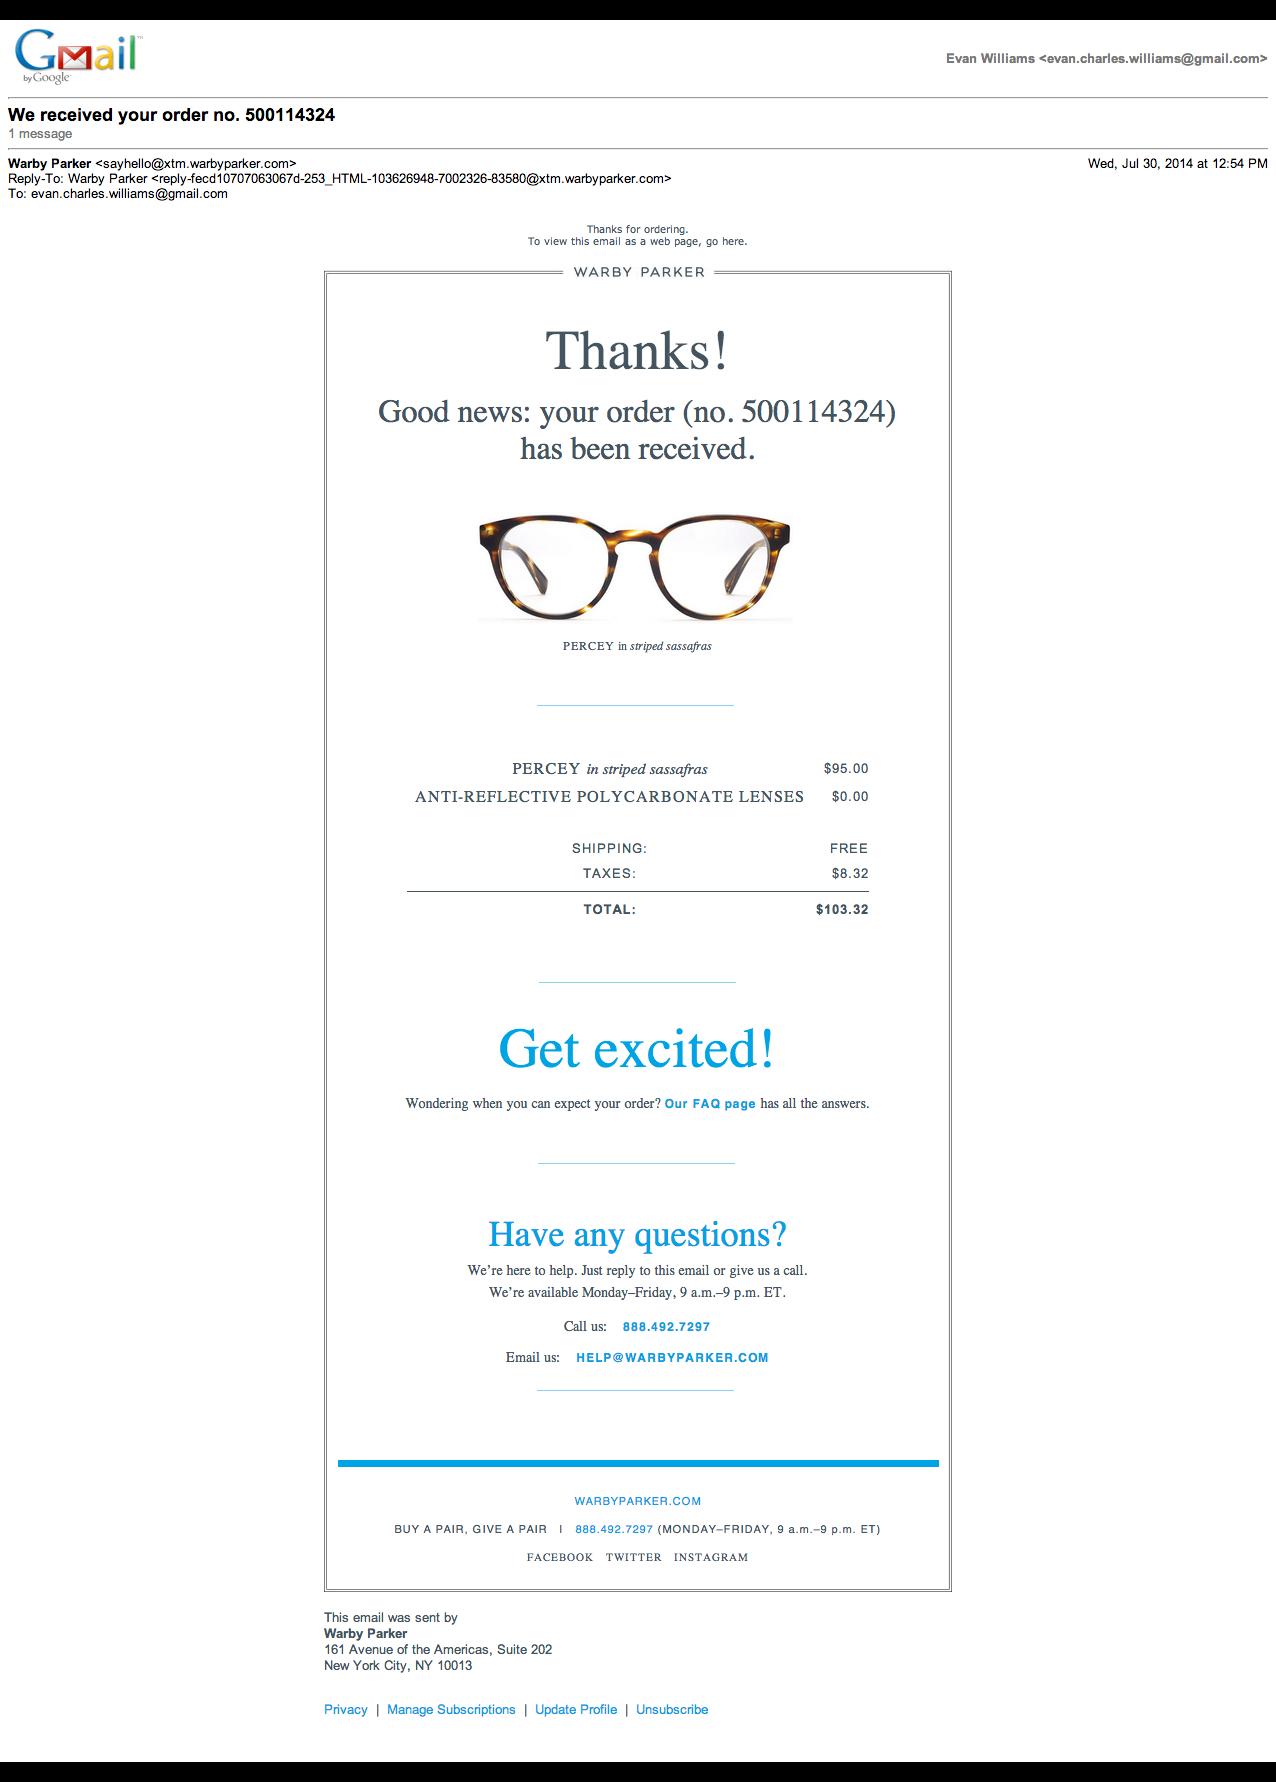 Warby Parker | order confirmation | Pinterest | Warby parker